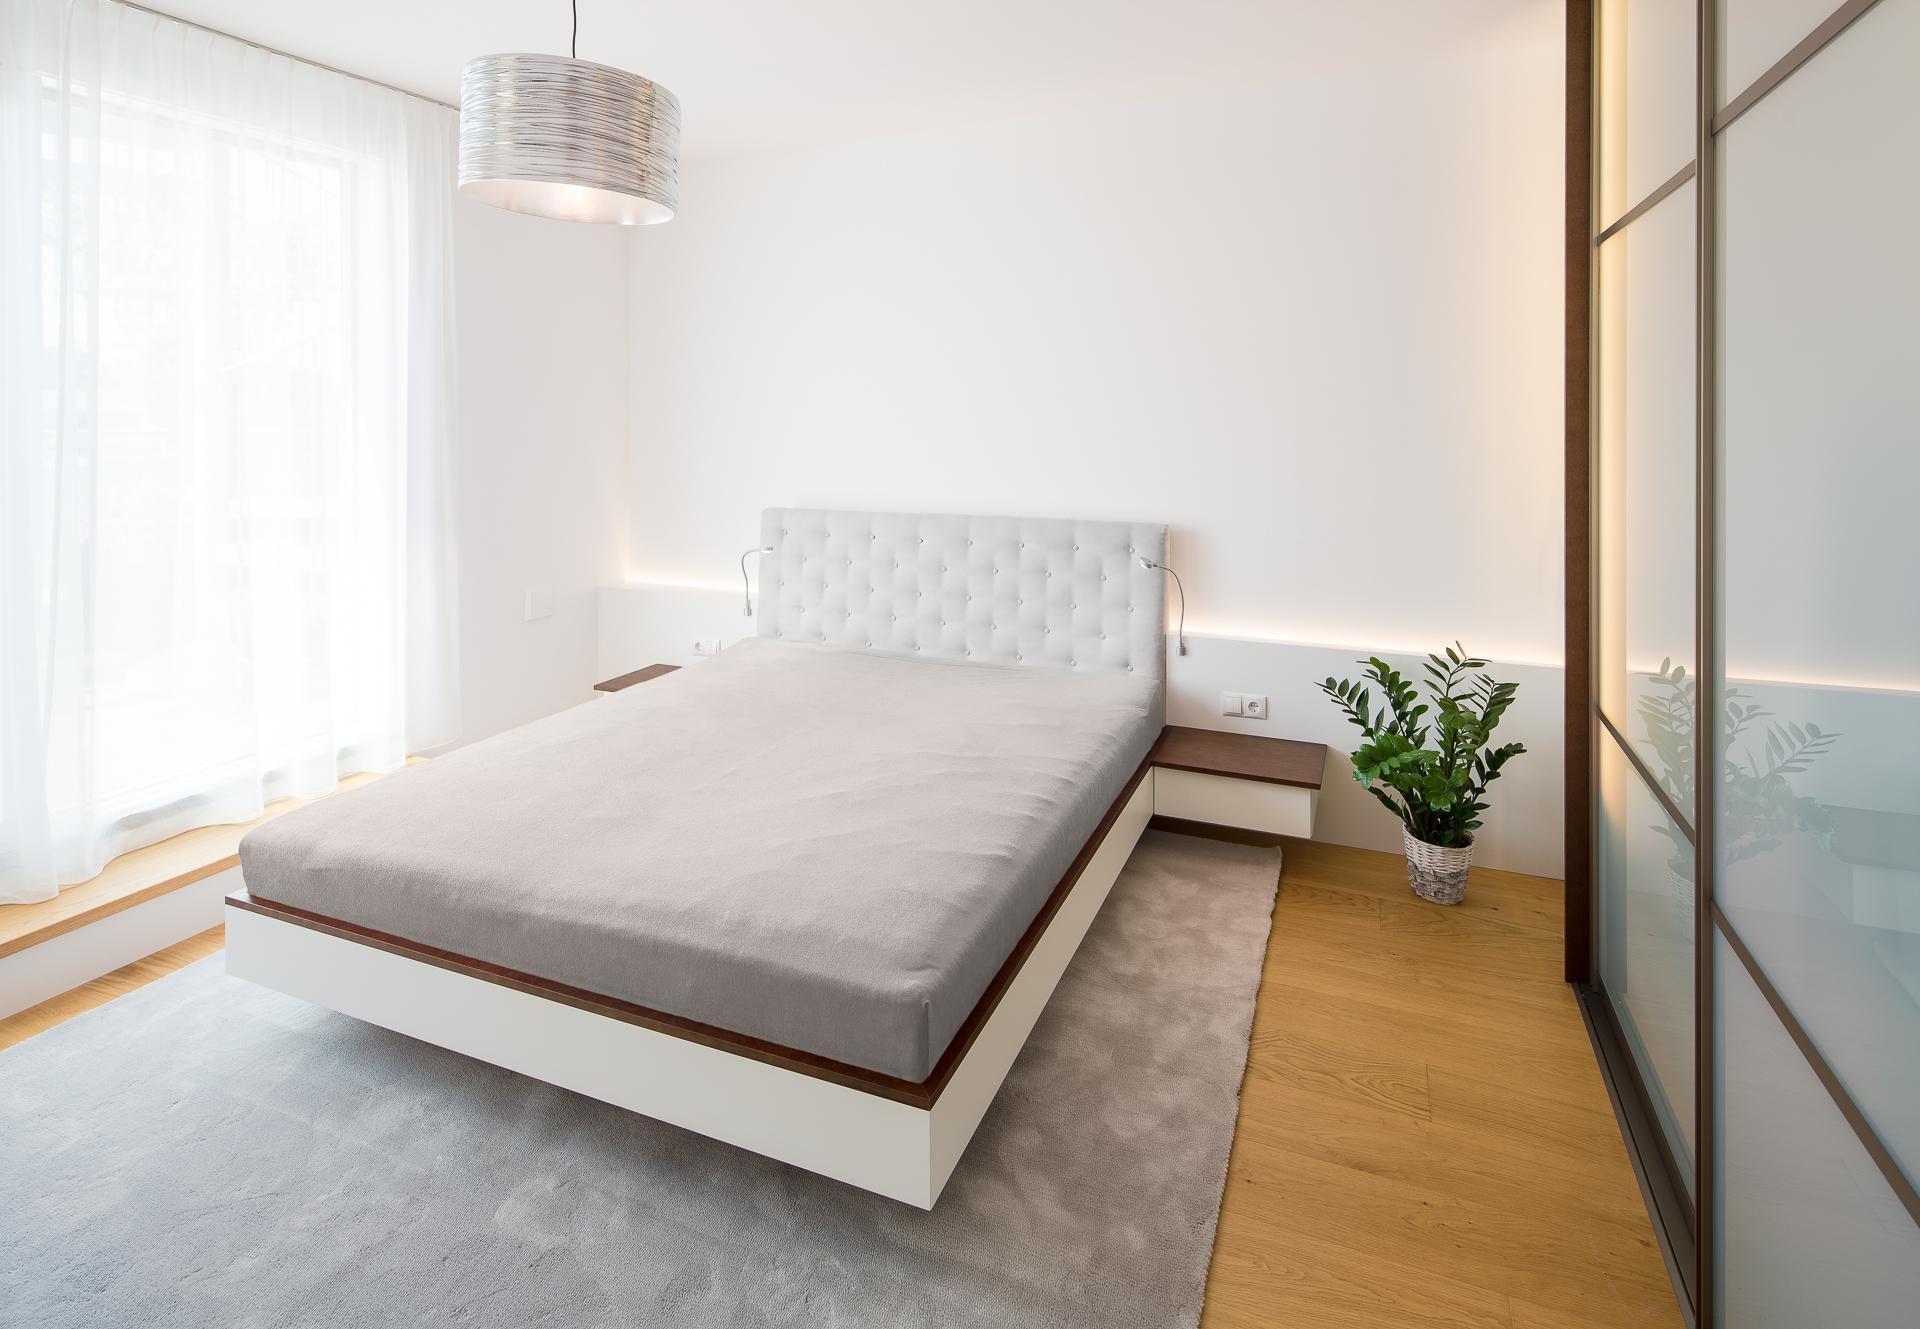 betthaupt bilder ideen couchstyle. Black Bedroom Furniture Sets. Home Design Ideas